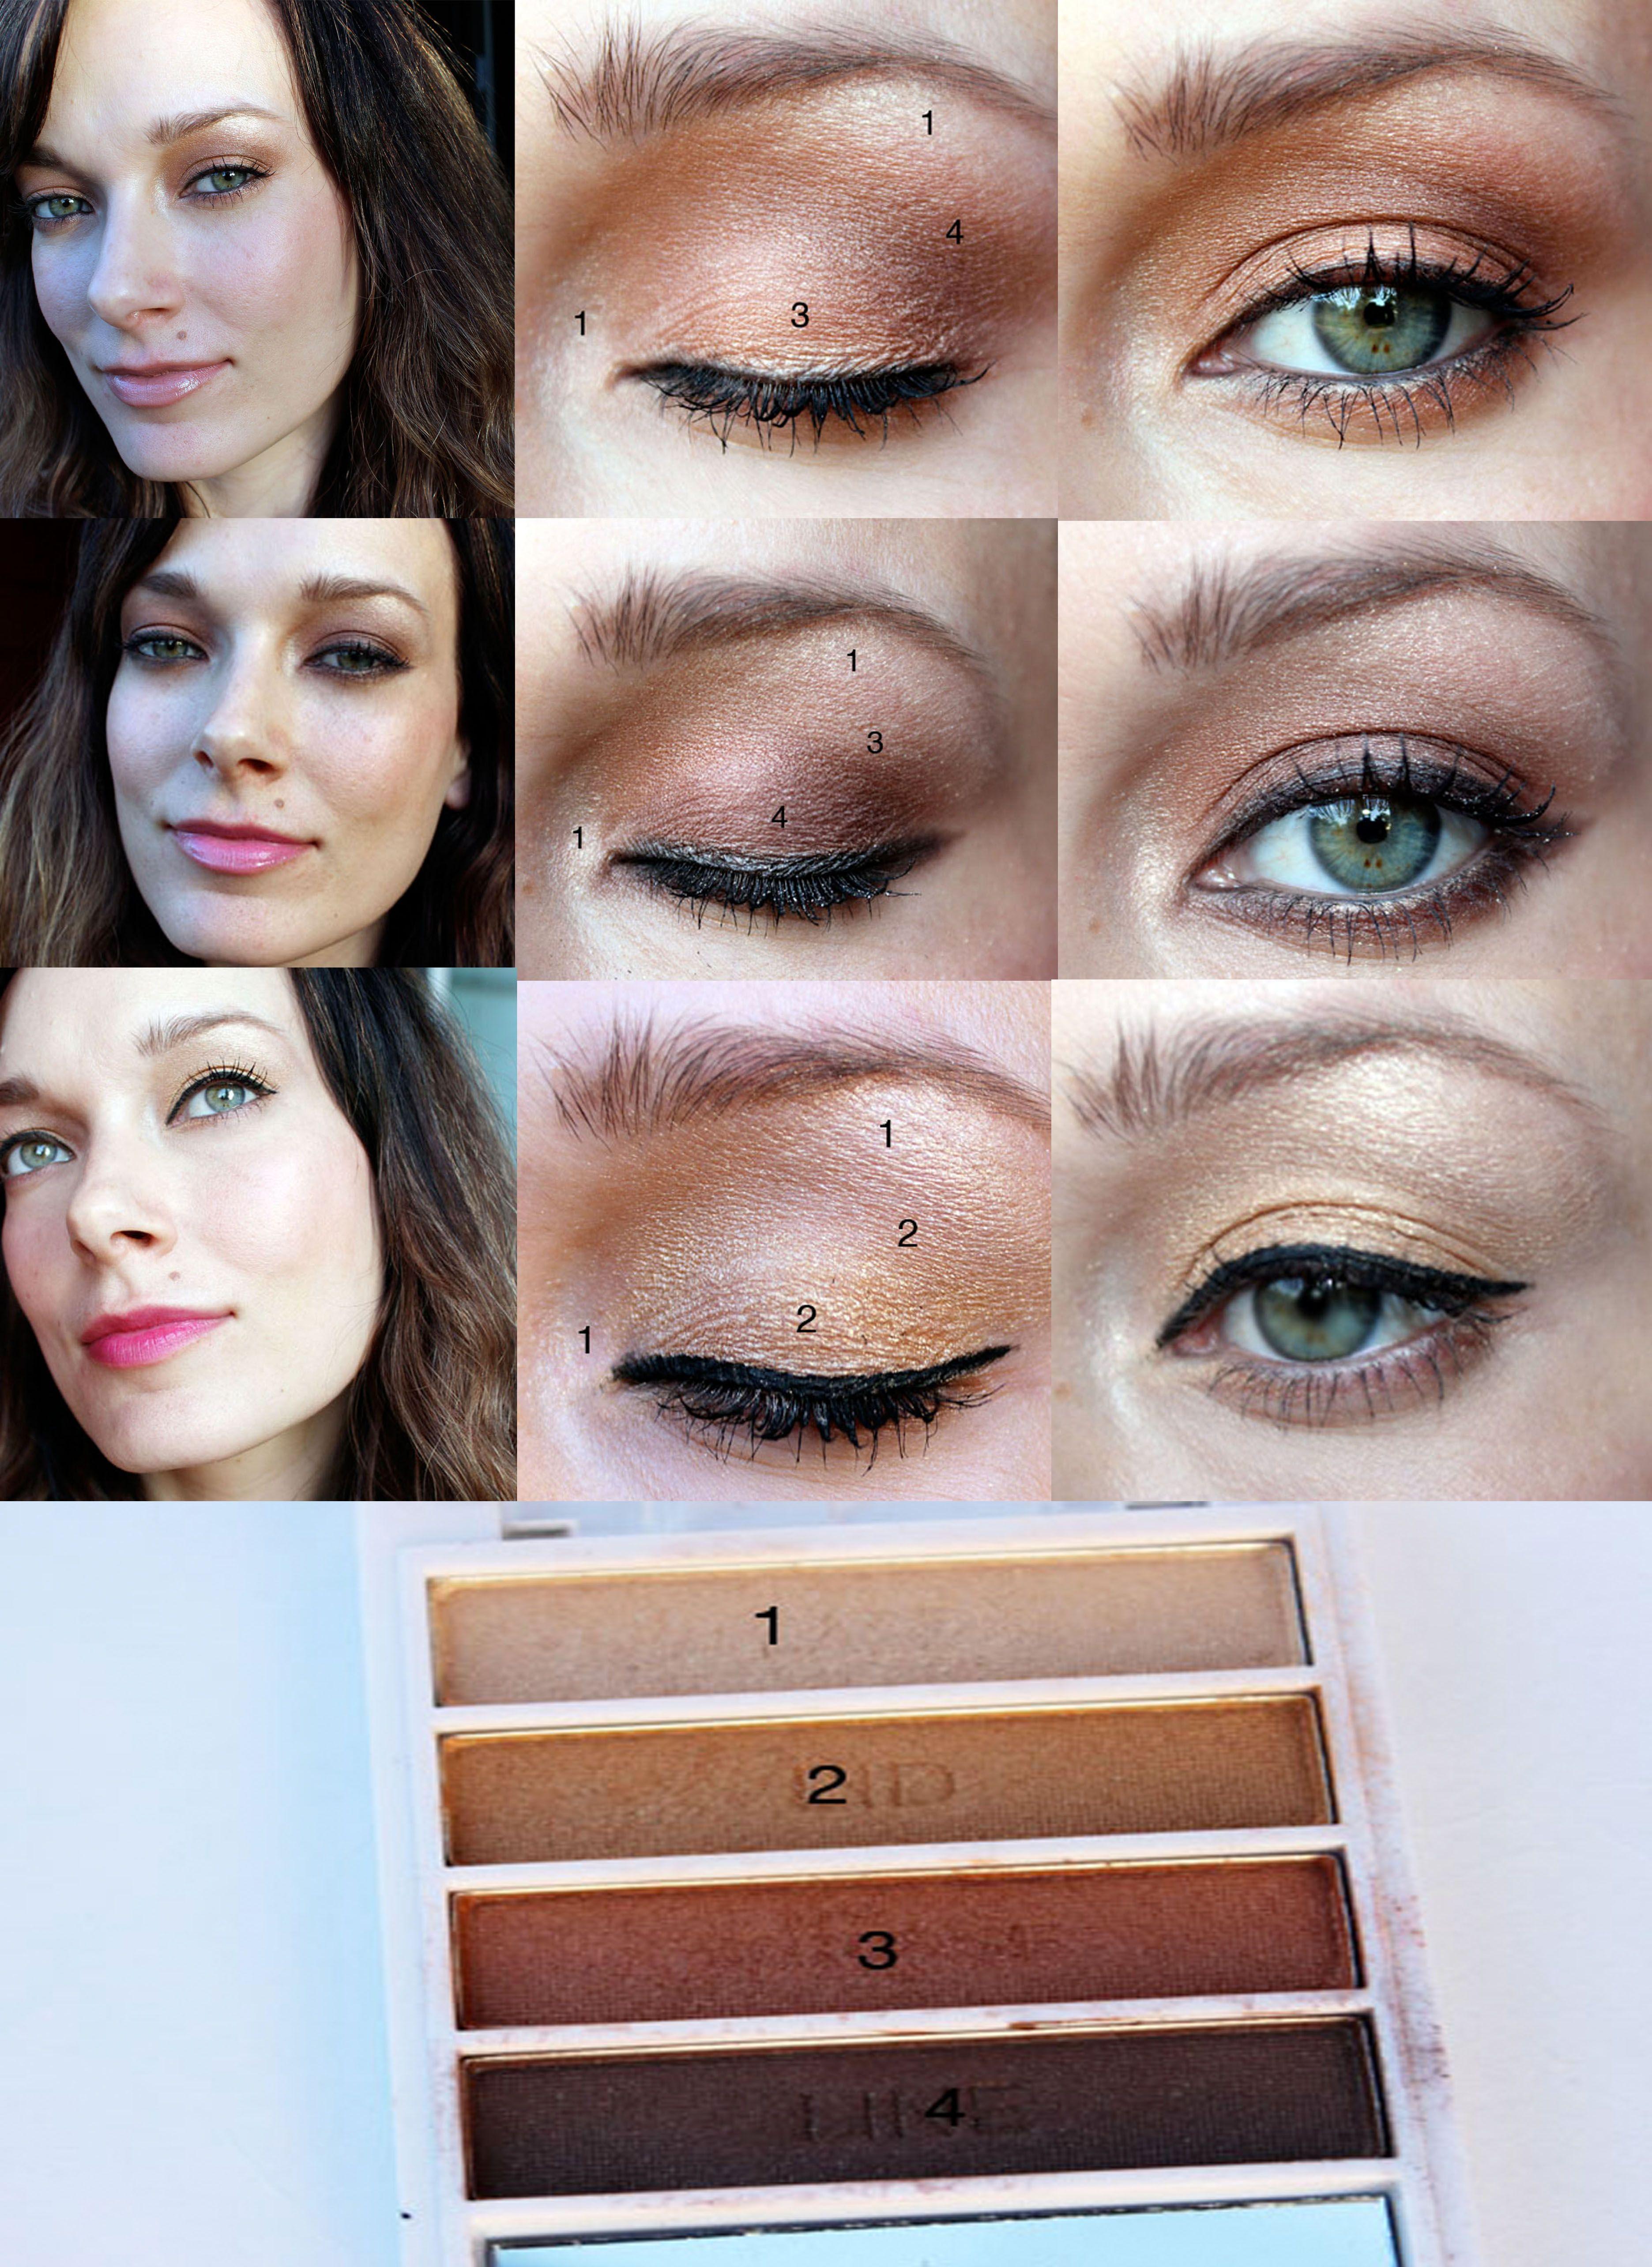 E.L.F Golden Goddess 2.00 Eyeshadow Palette and 3 Looks